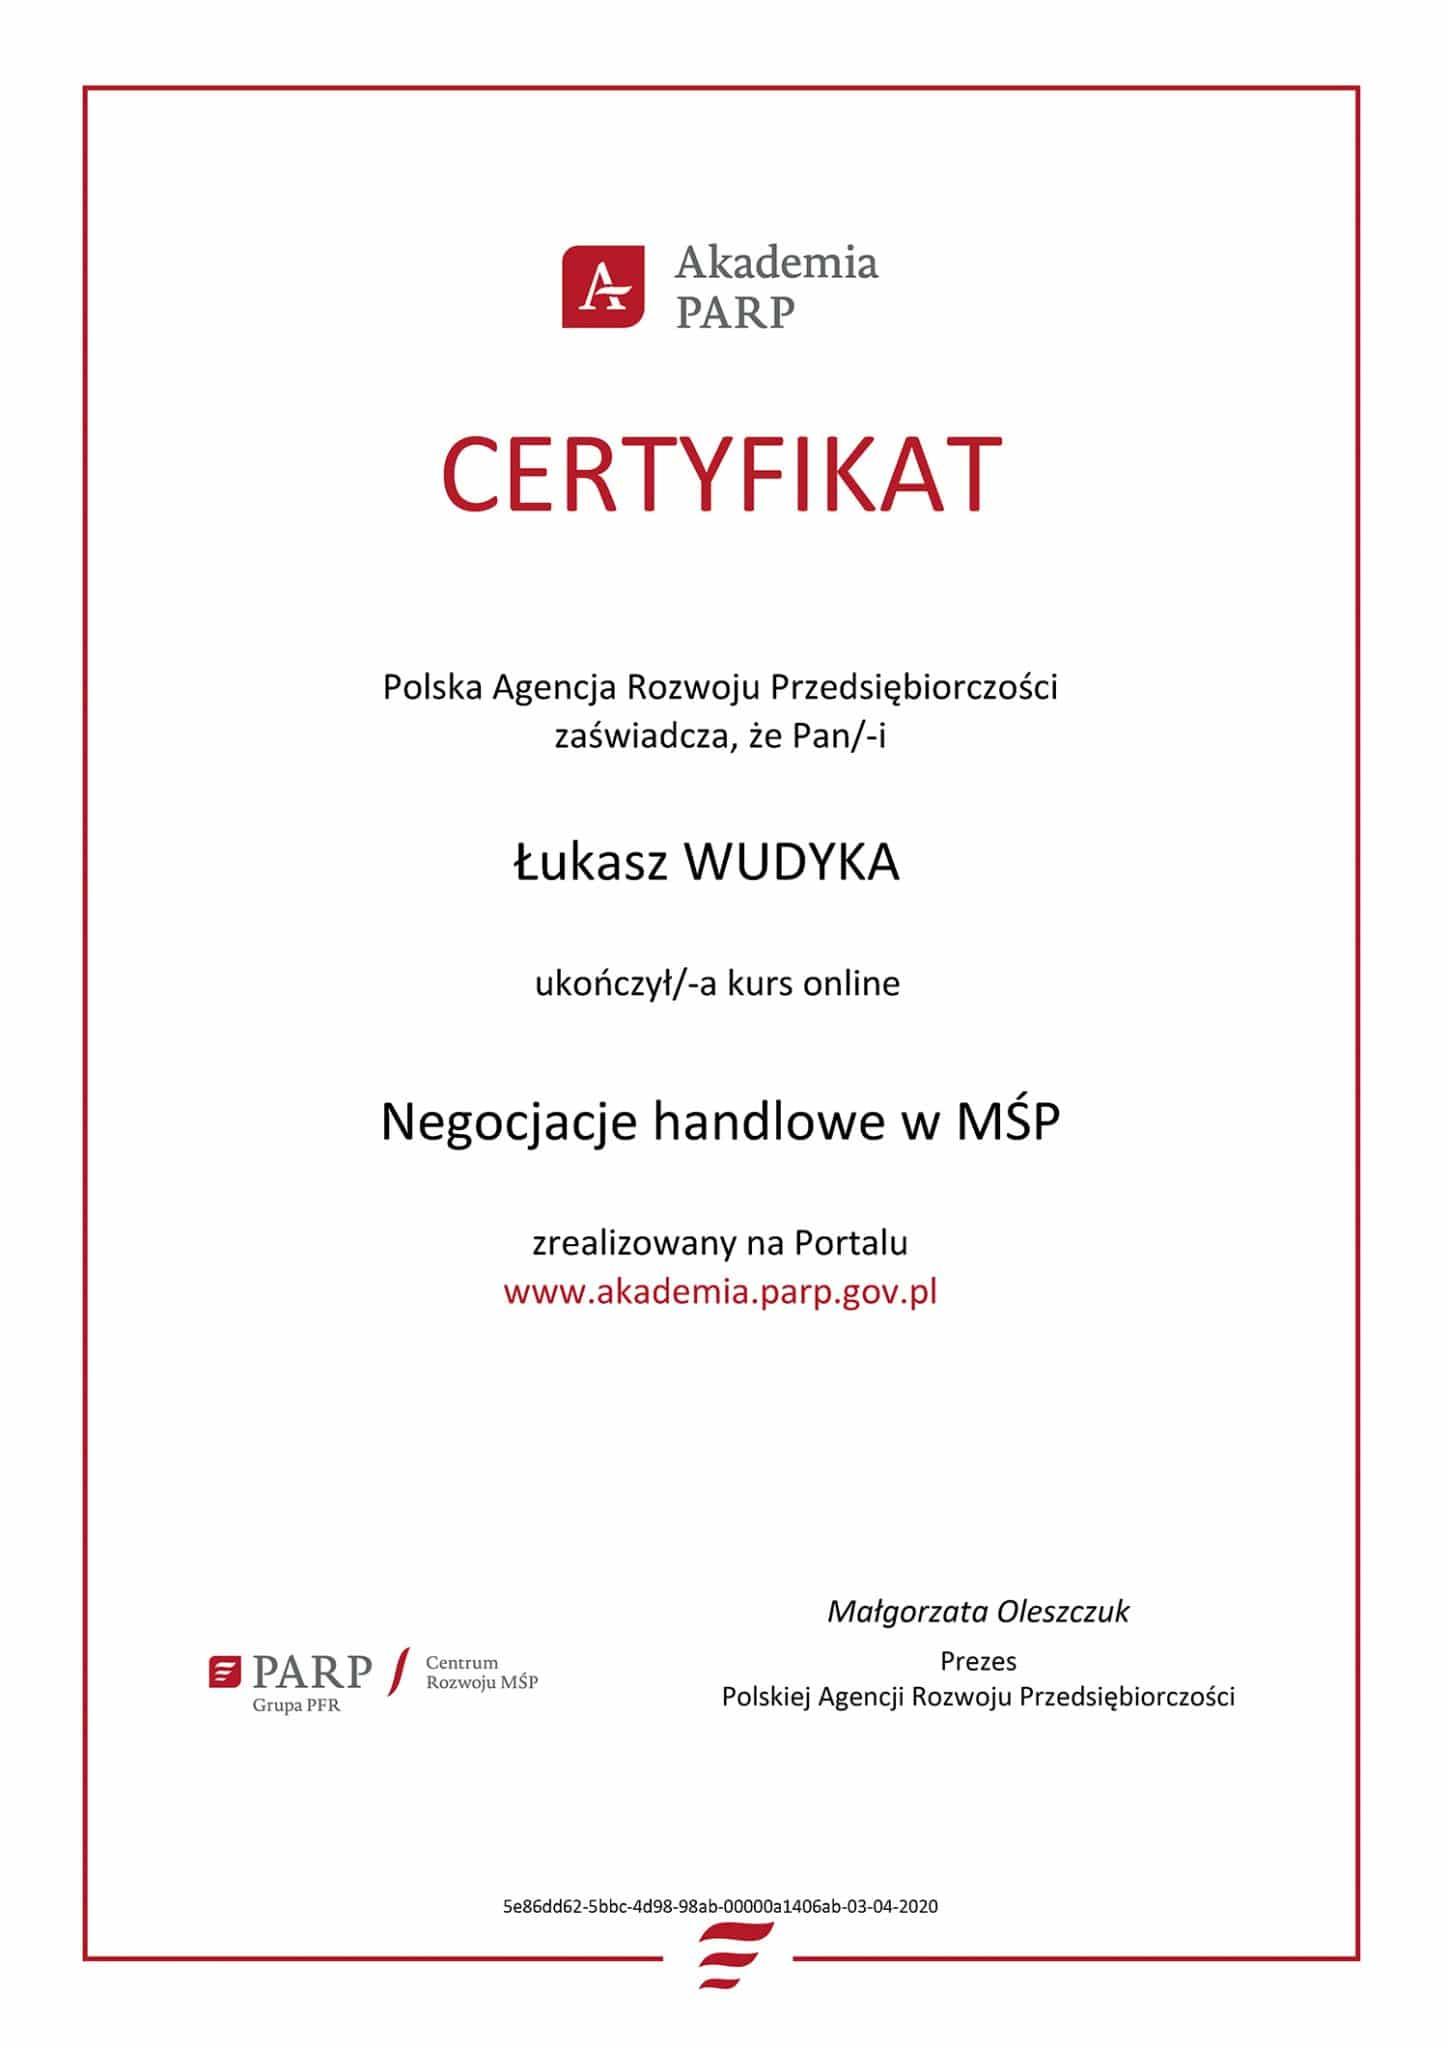 Certyfikat PARP negocjacje handlowe